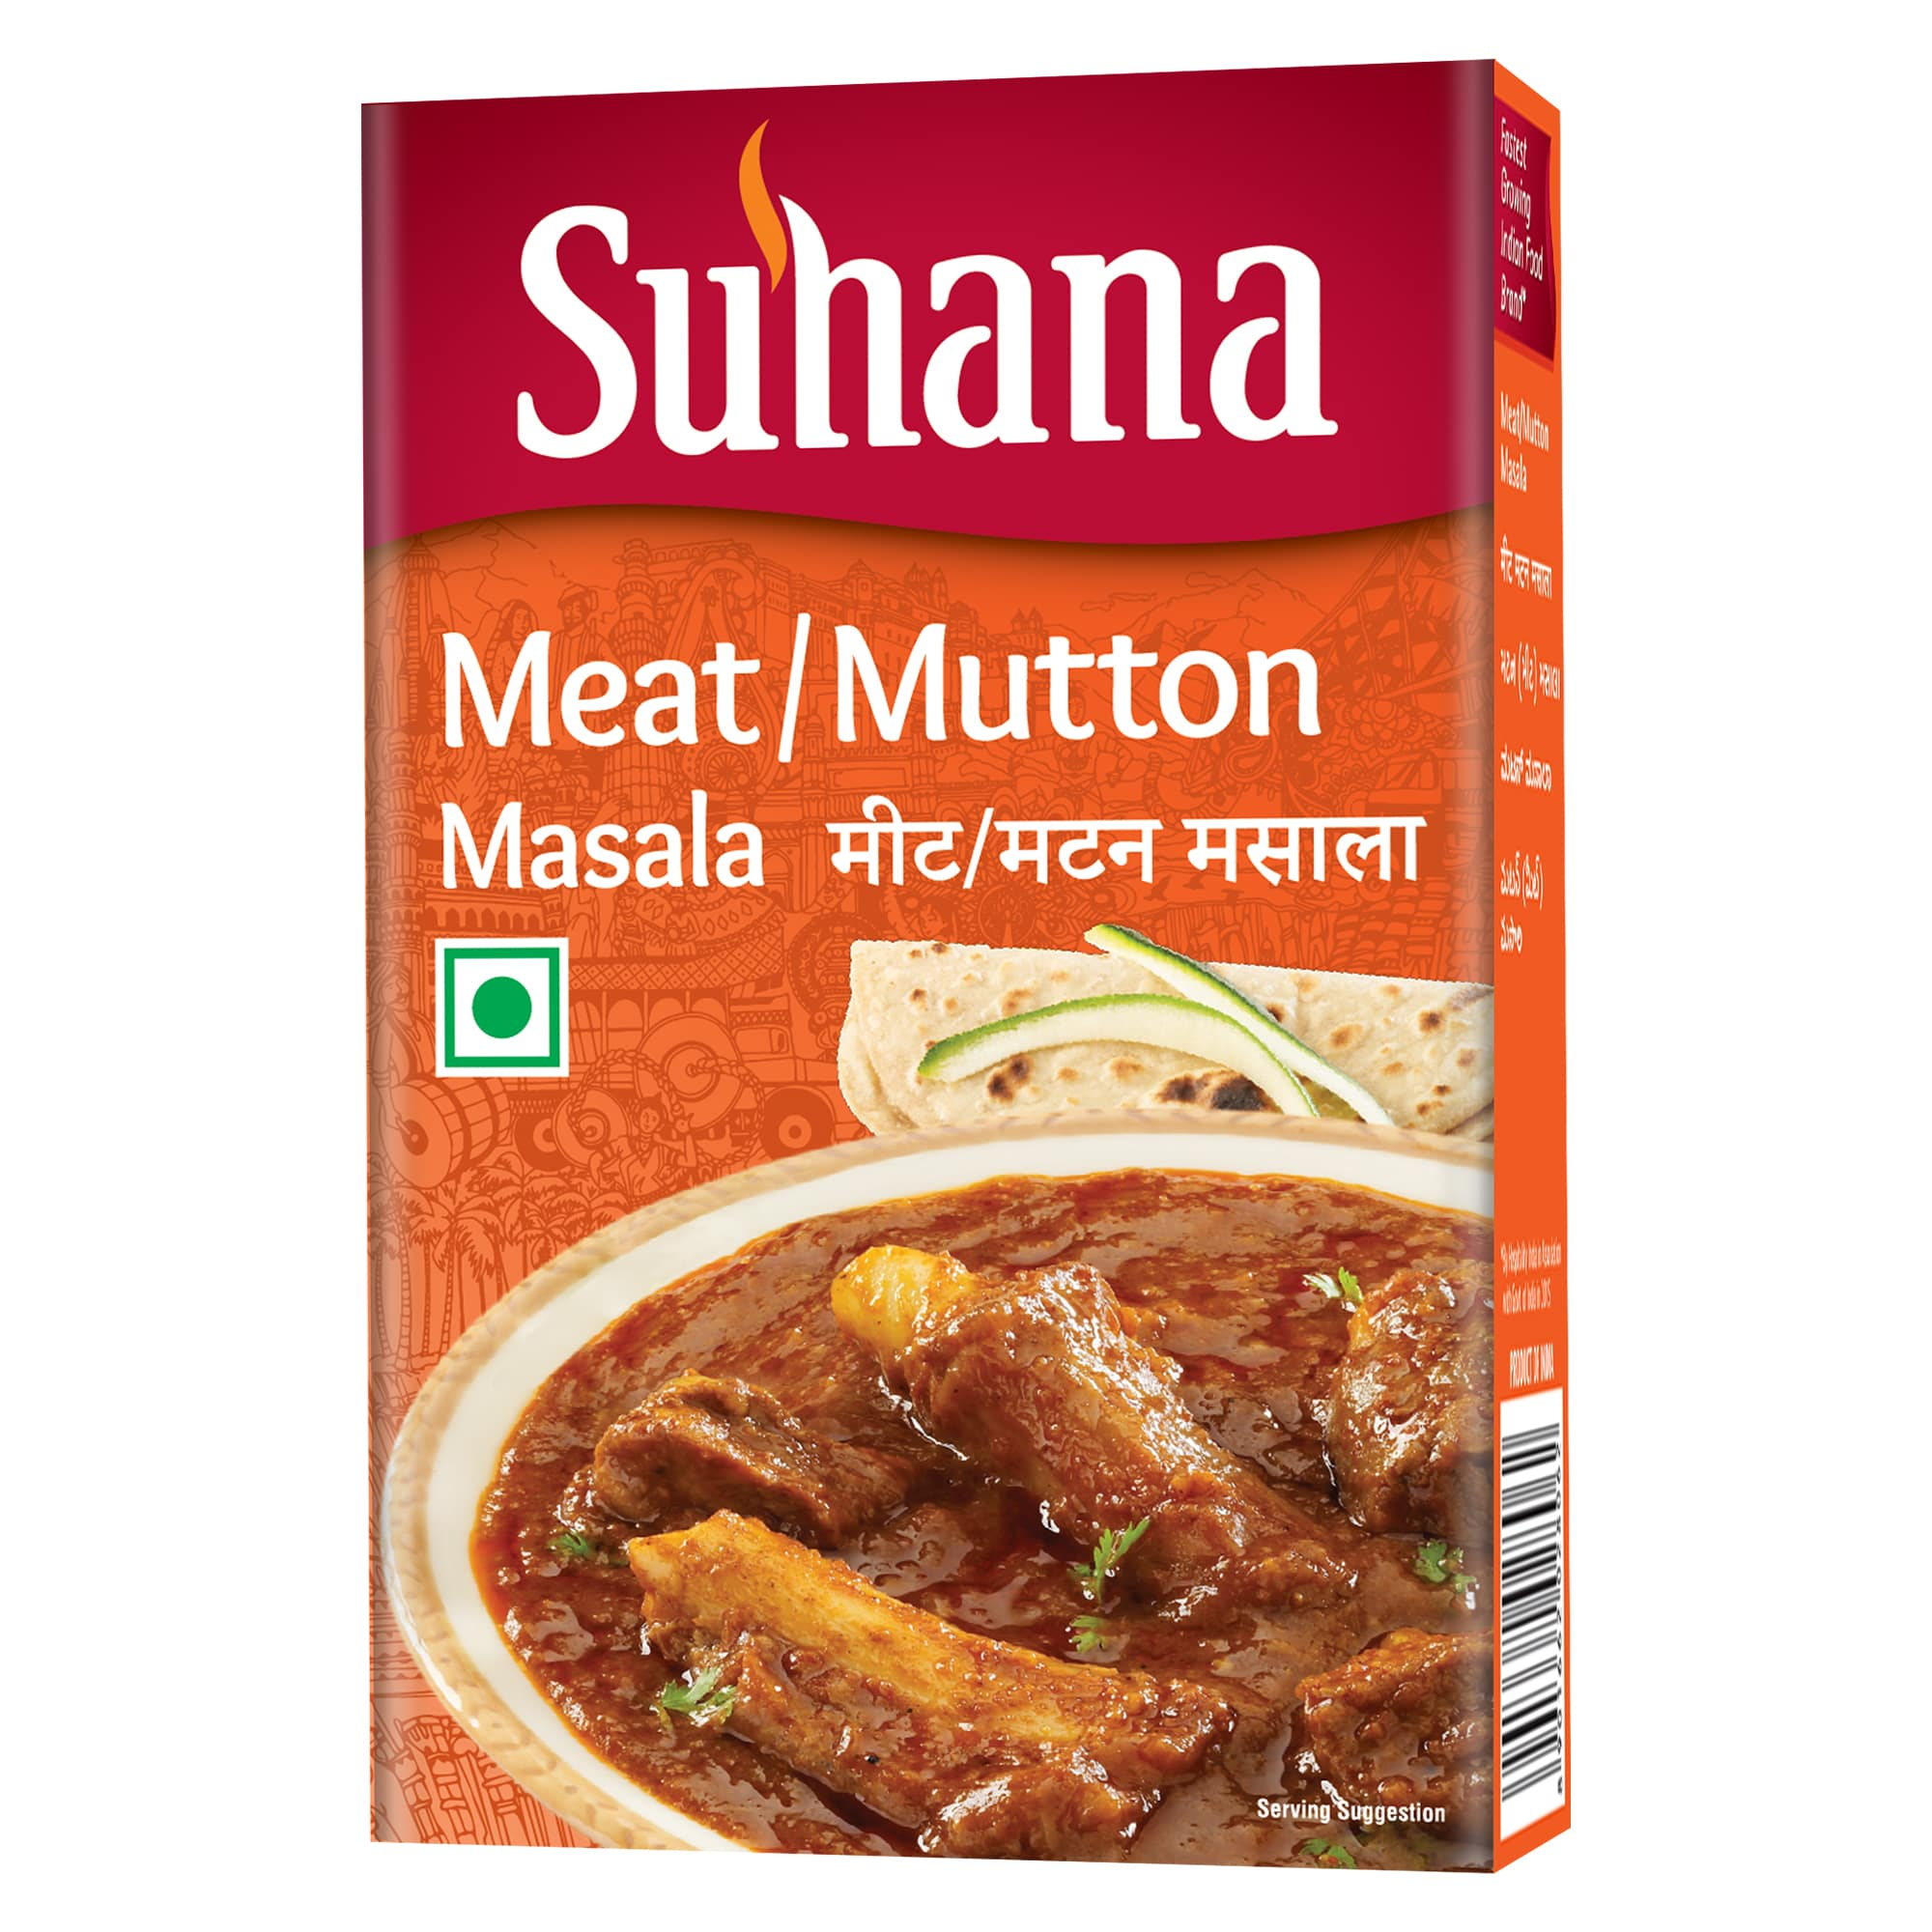 Suhana Mutton (Meat) Masala